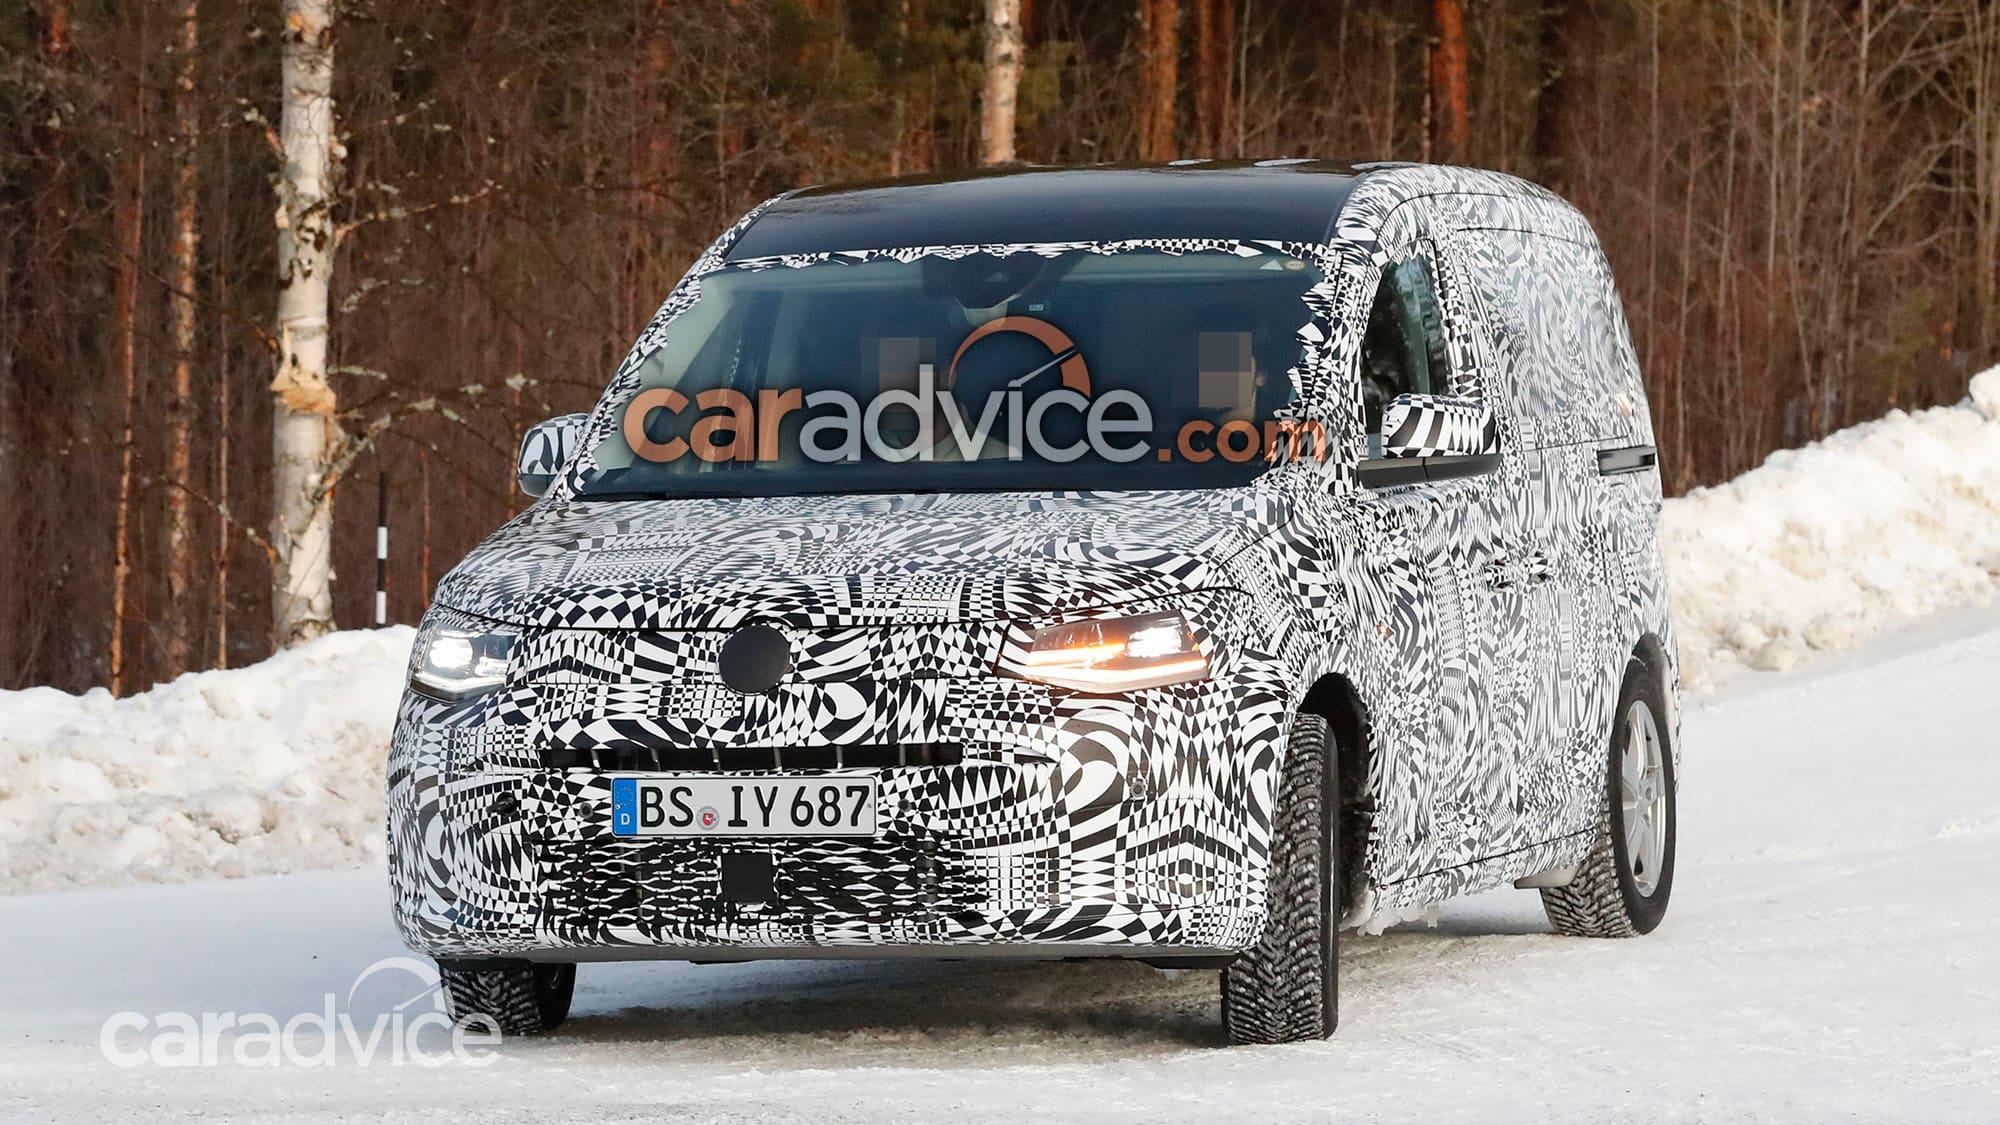 2021 Volkswagen Caddy interior spied | CarAdvice